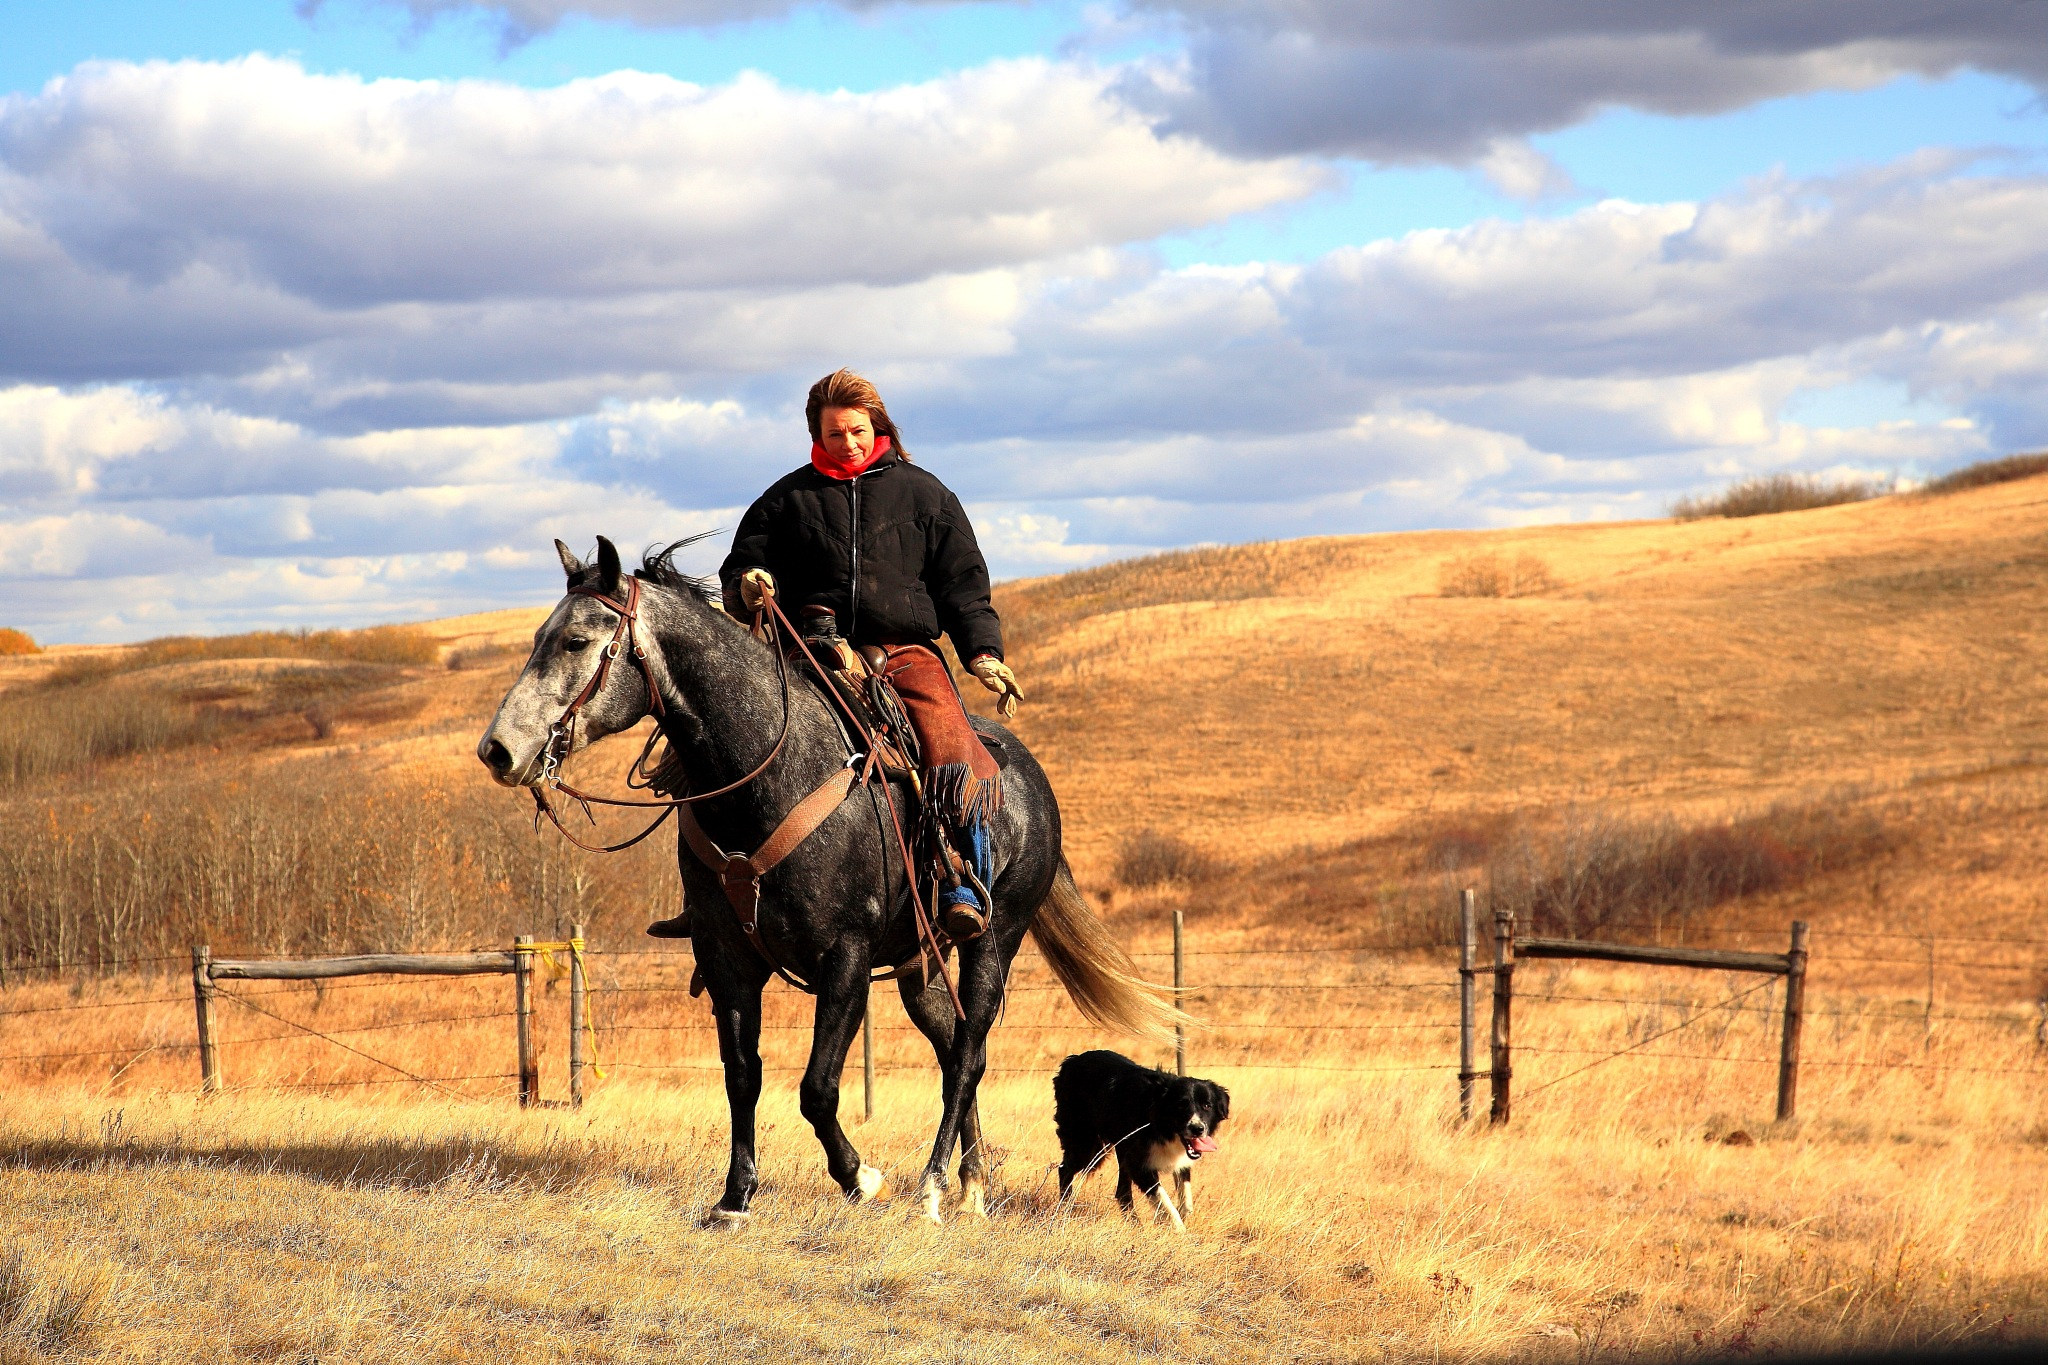 Northern Alberta on the range by Miloliidrifter